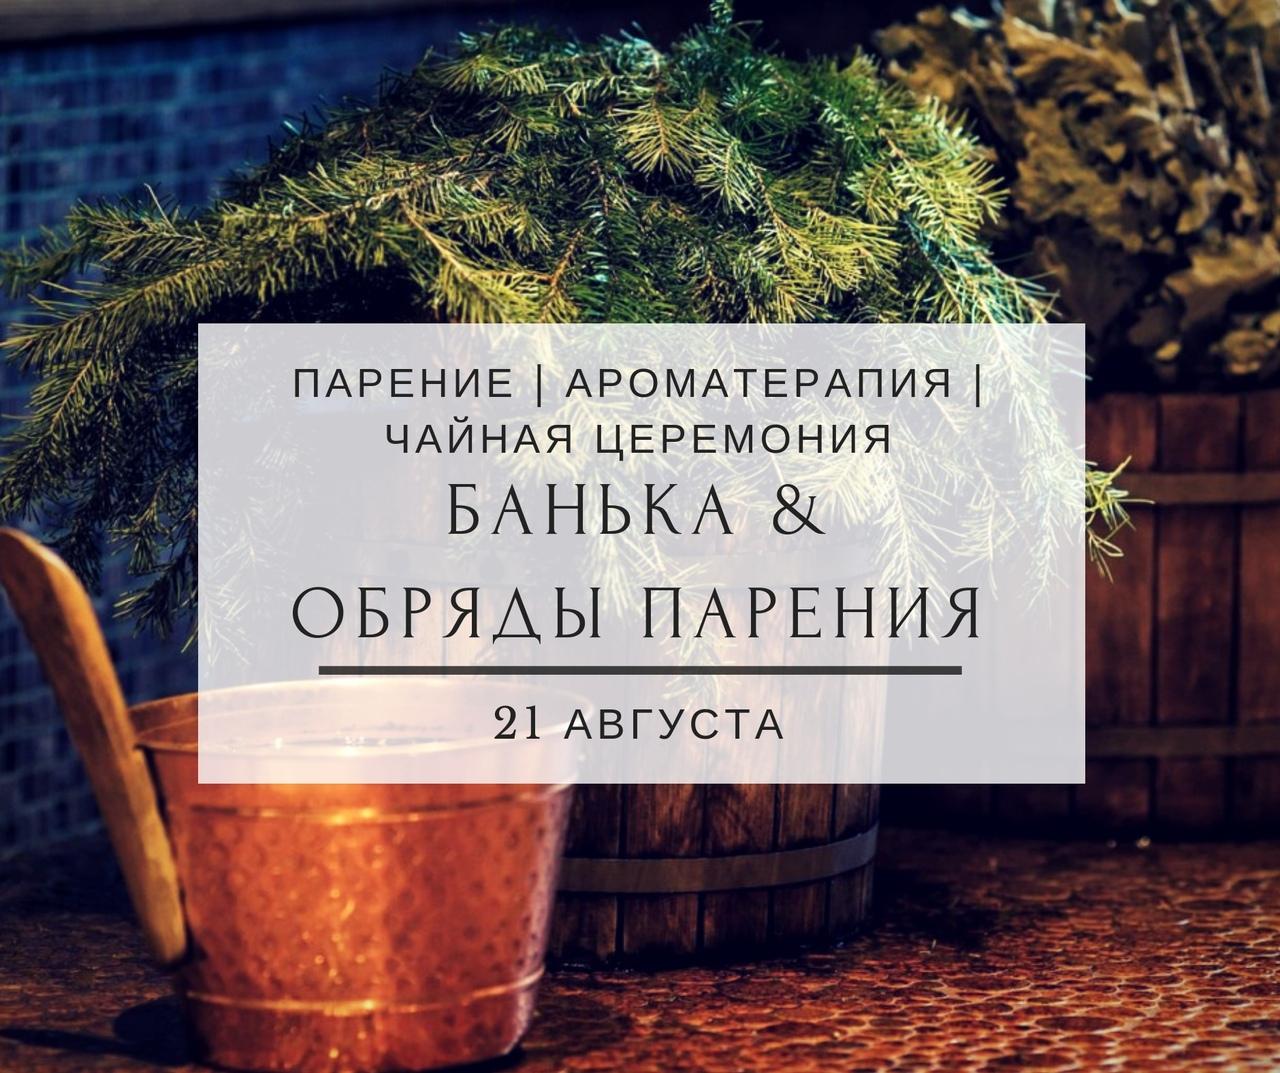 Афиша Тюмень БАНЬКА / ОБРЯДЫ ПАРЕНИЯ / 21.08